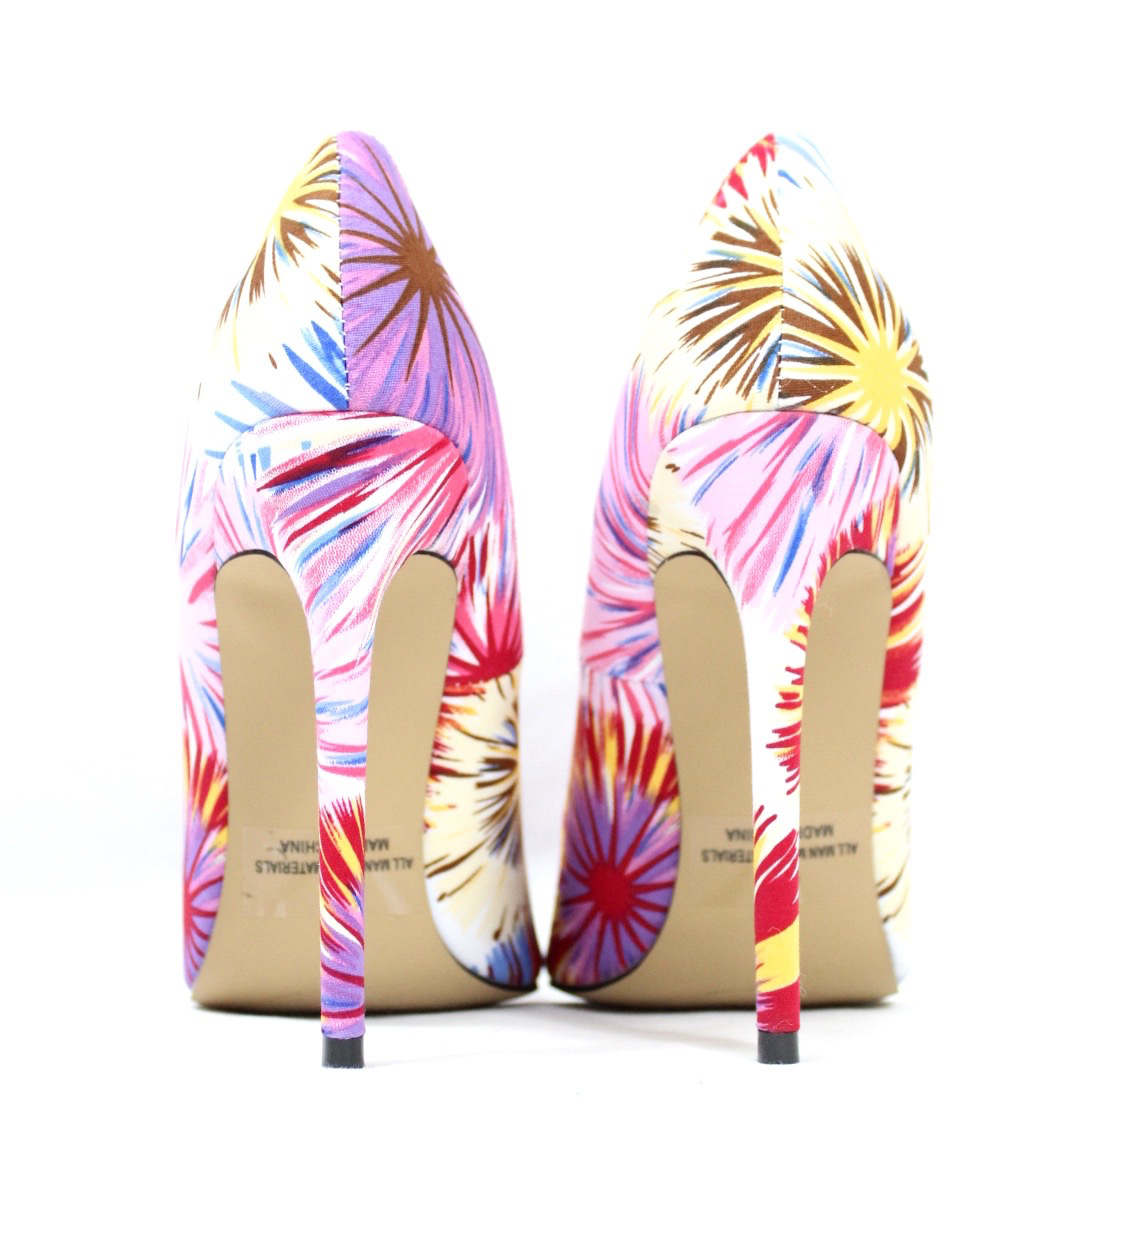 Shoe Republic Cajun White Pointy Toe Pumps-4558